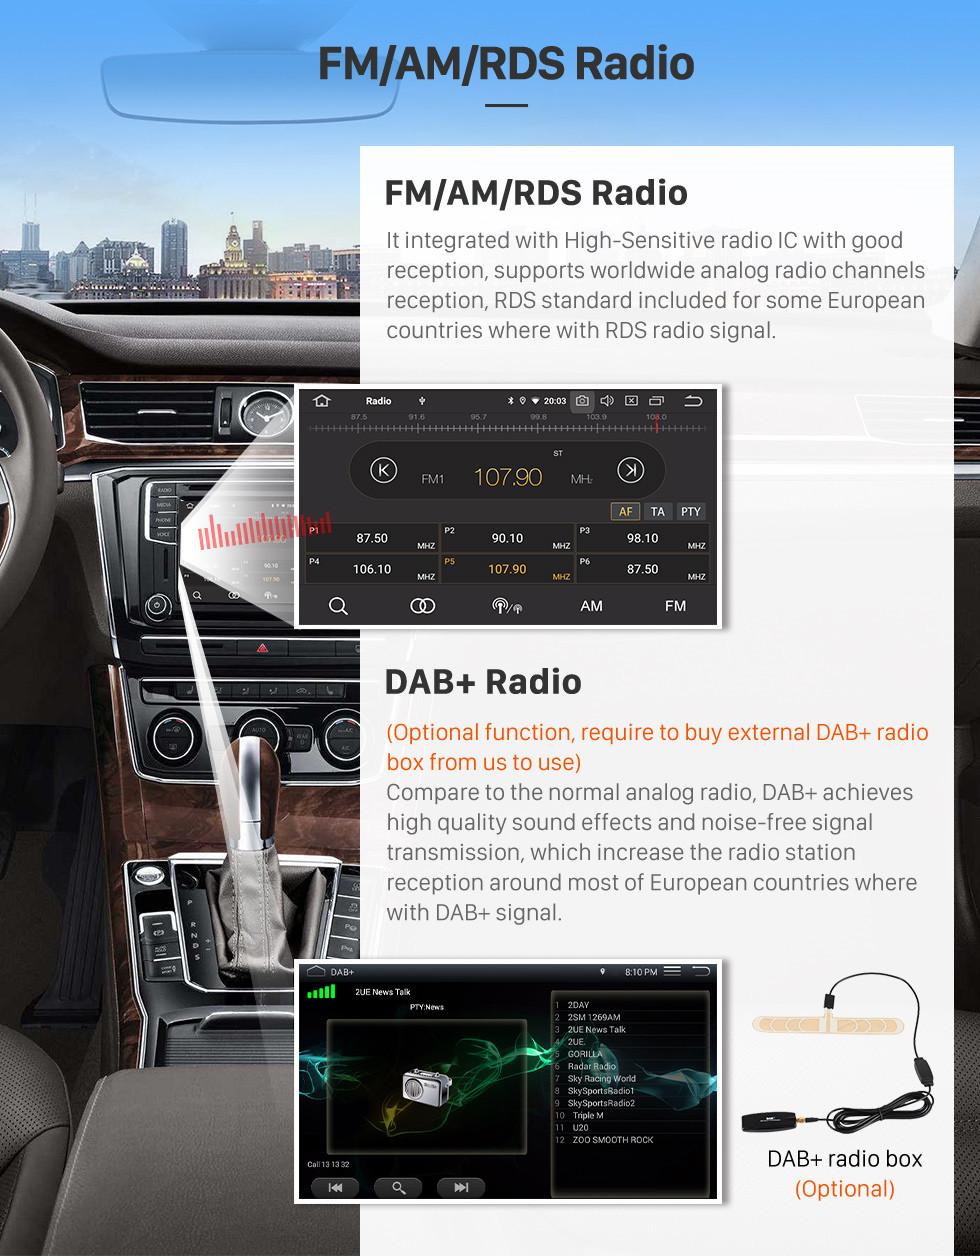 Seicane 9 inch HD Touchscreen 2016 Hyundai Elantra LHD Android 9.0 Radio DVD Player GPS Navigation with wifi Bluetooth Mirror Link OBD2 DAB+ DVR AUX